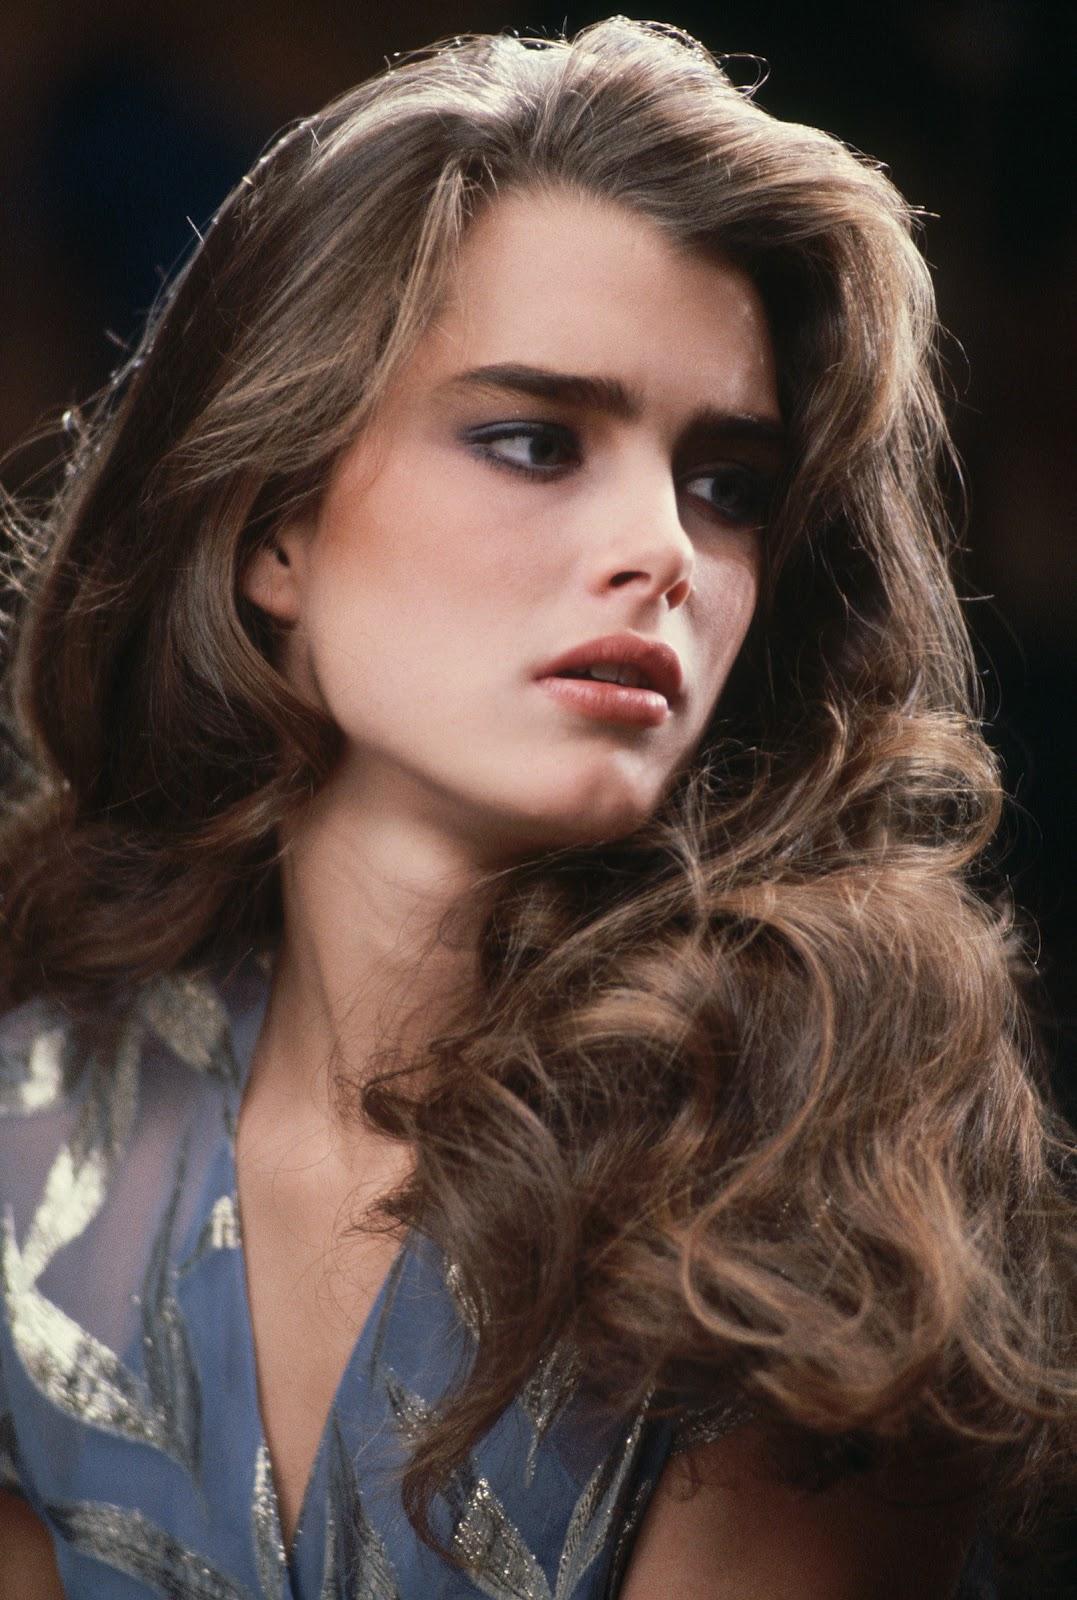 http://1.bp.blogspot.com/-xLvXtO1iUe4/UAQazy0GH9I/AAAAAAAAEFM/WU-C273_N9s/s1600/983ba_celebrity_city_Brooke_Shields_5.jpg